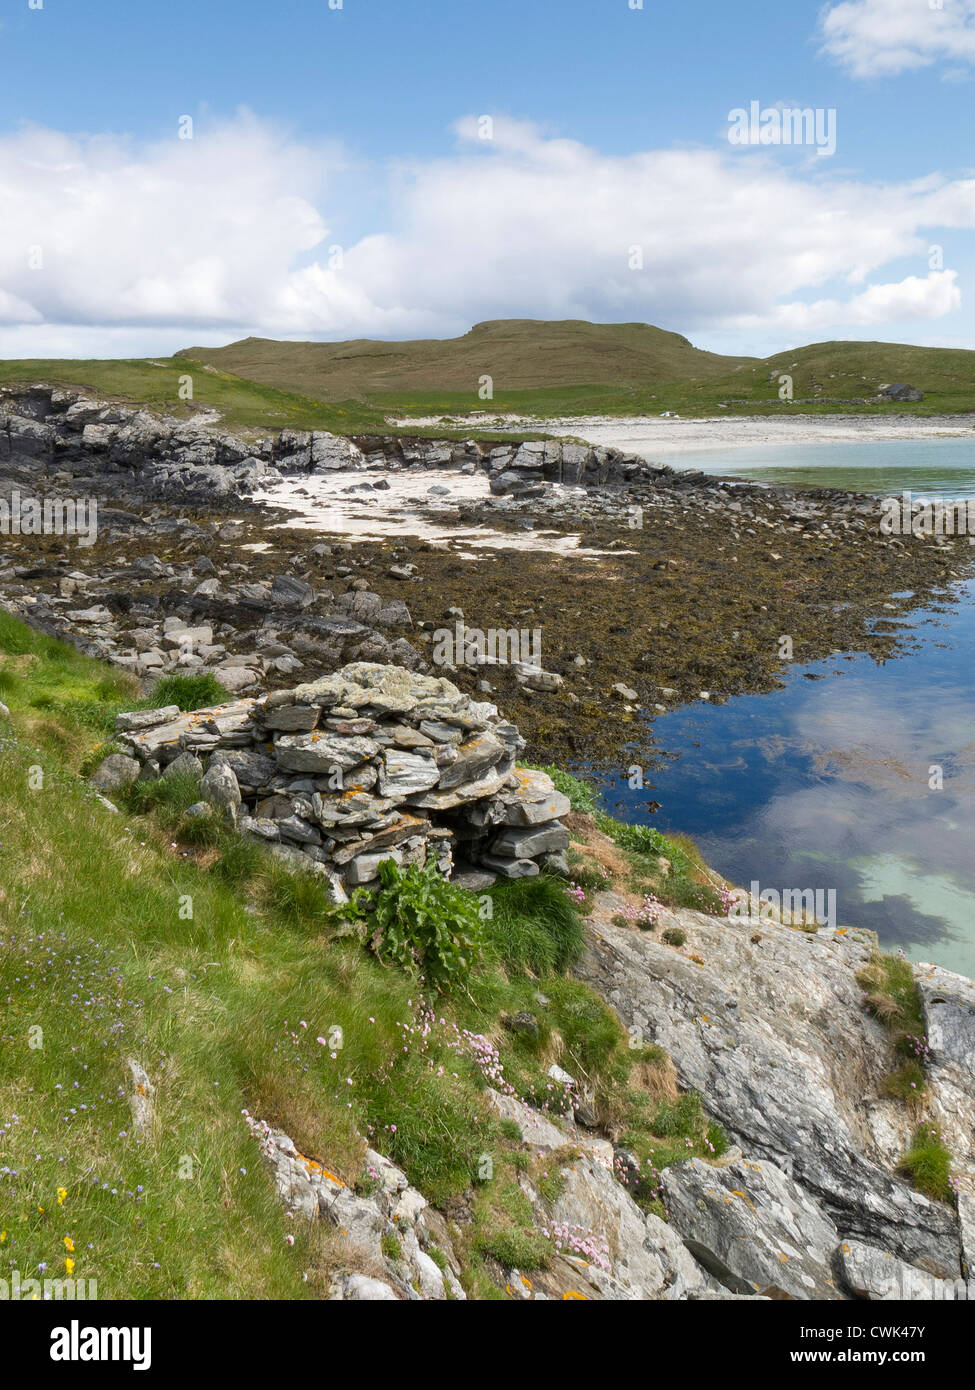 Disused otter trap on the coast of Shetland Mainland. June 2012. - Stock Image